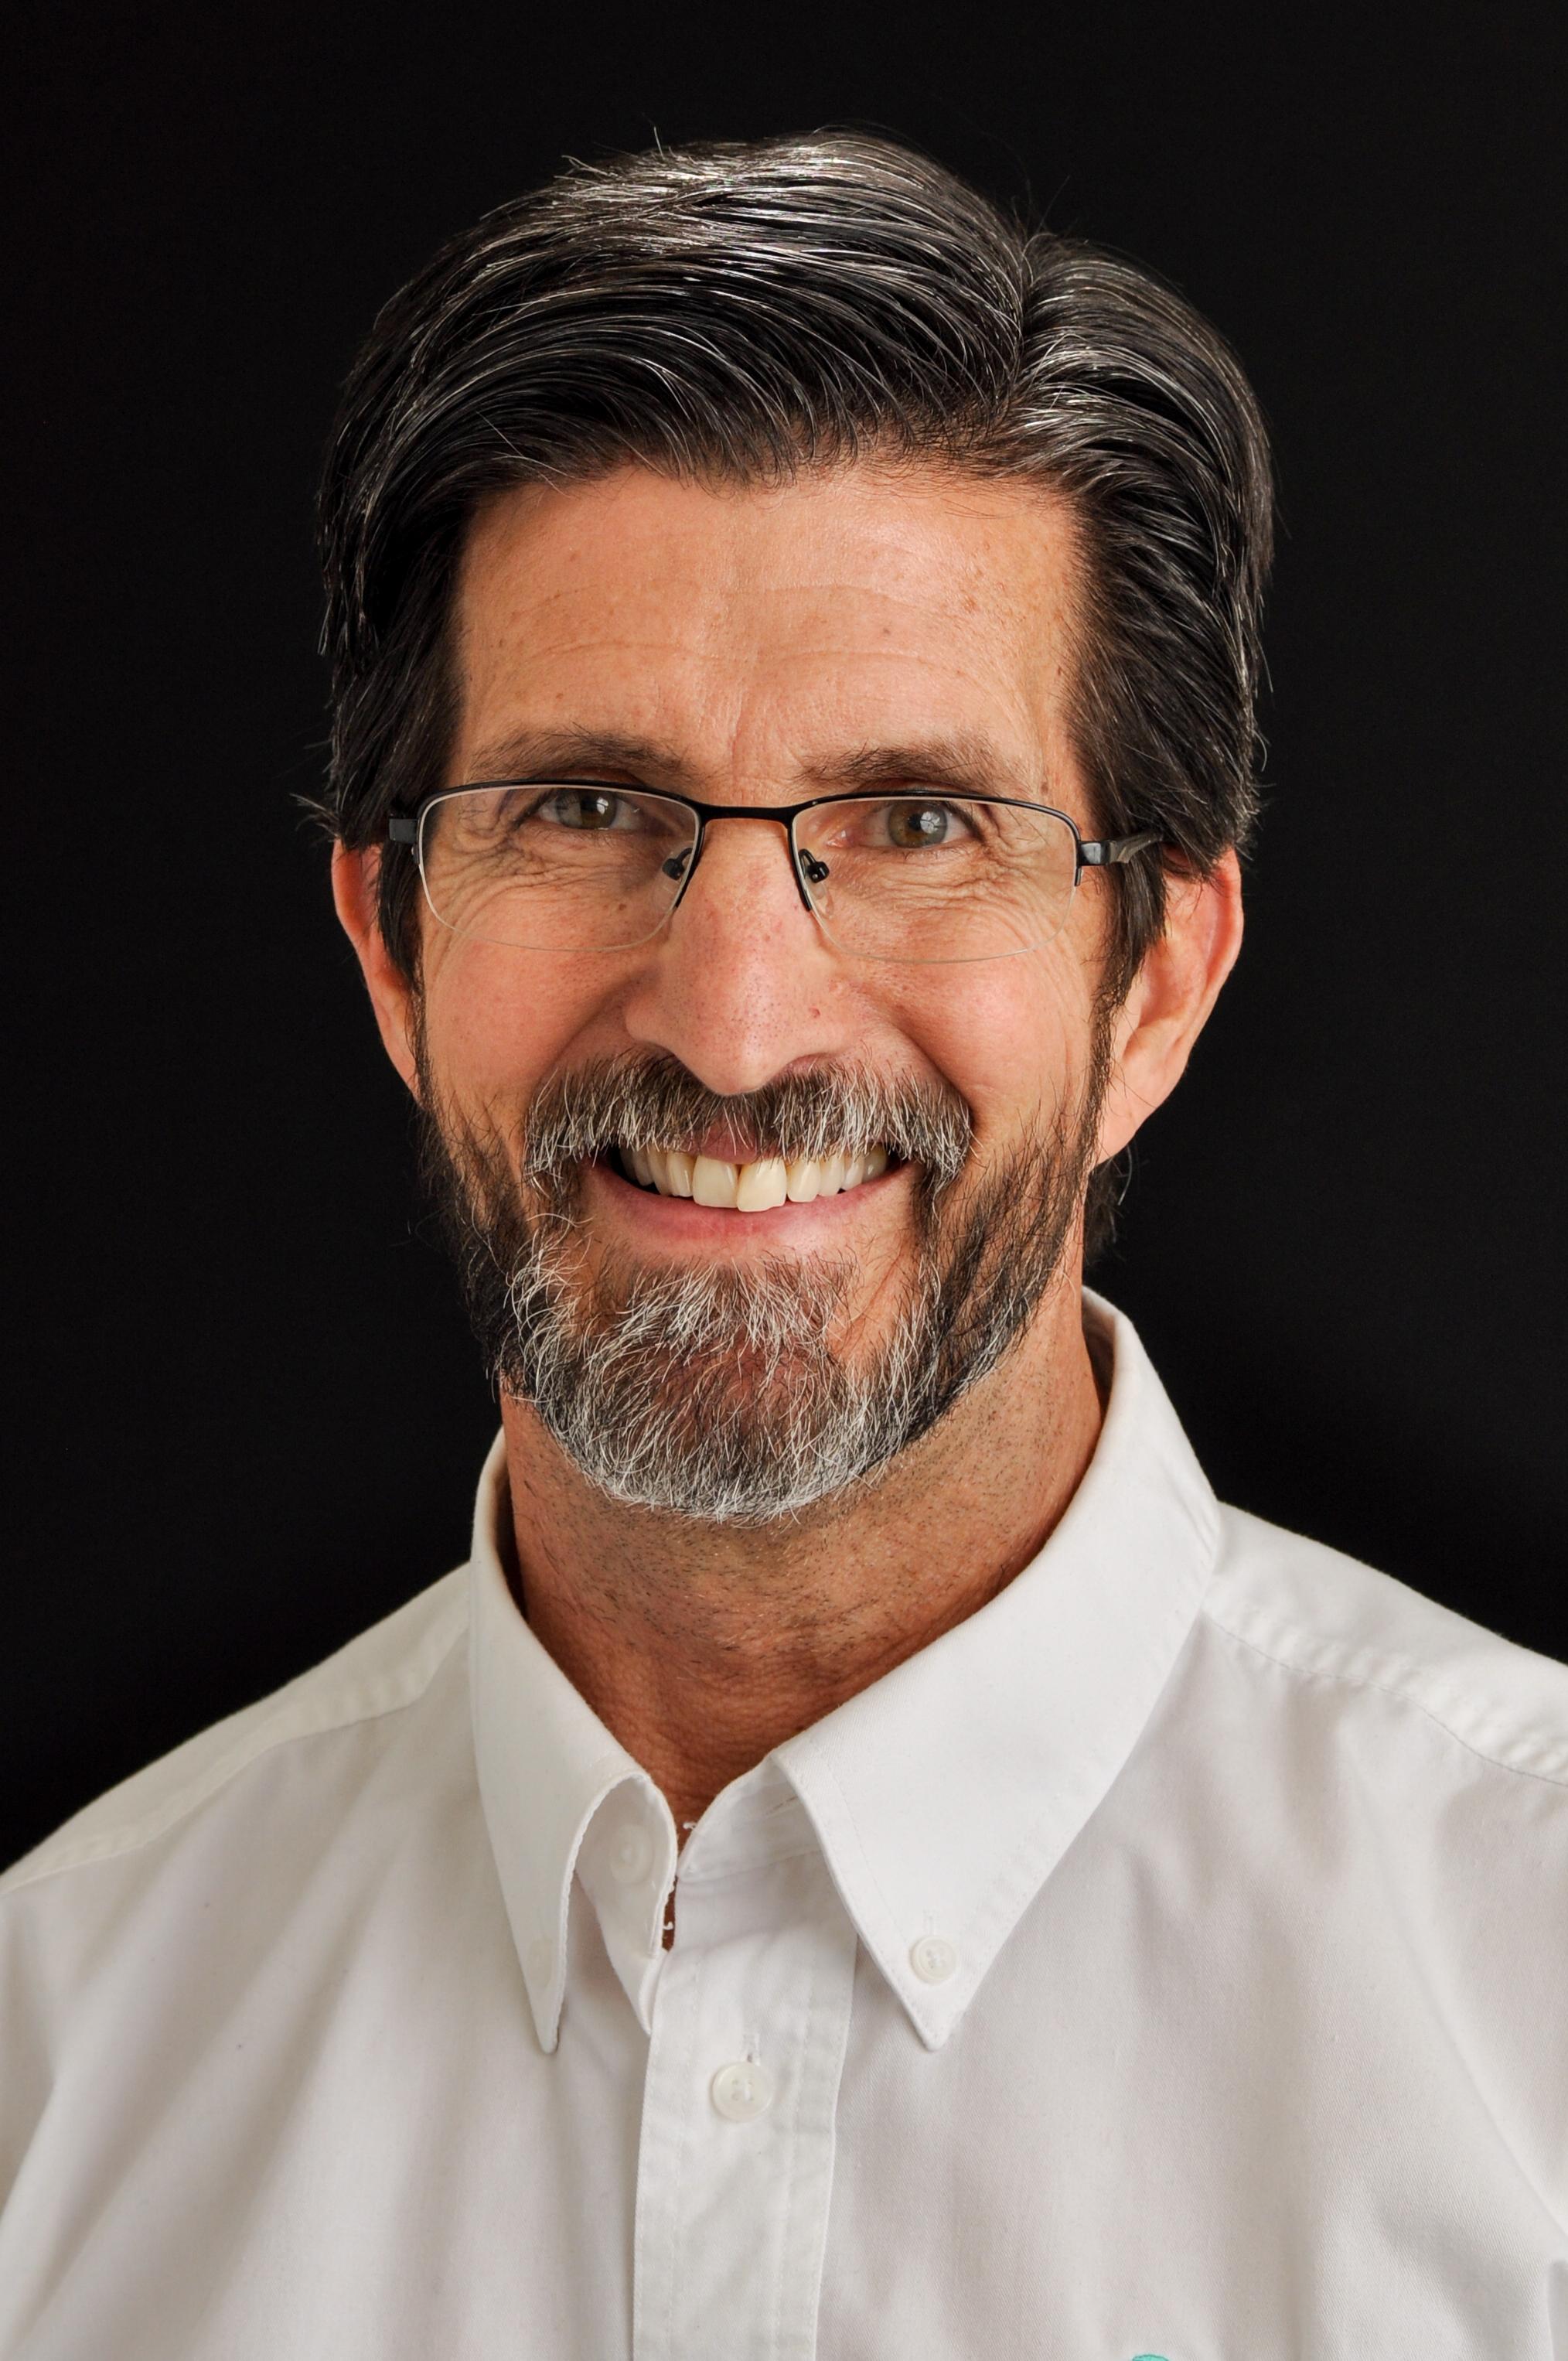 Dr. Jeff Benson